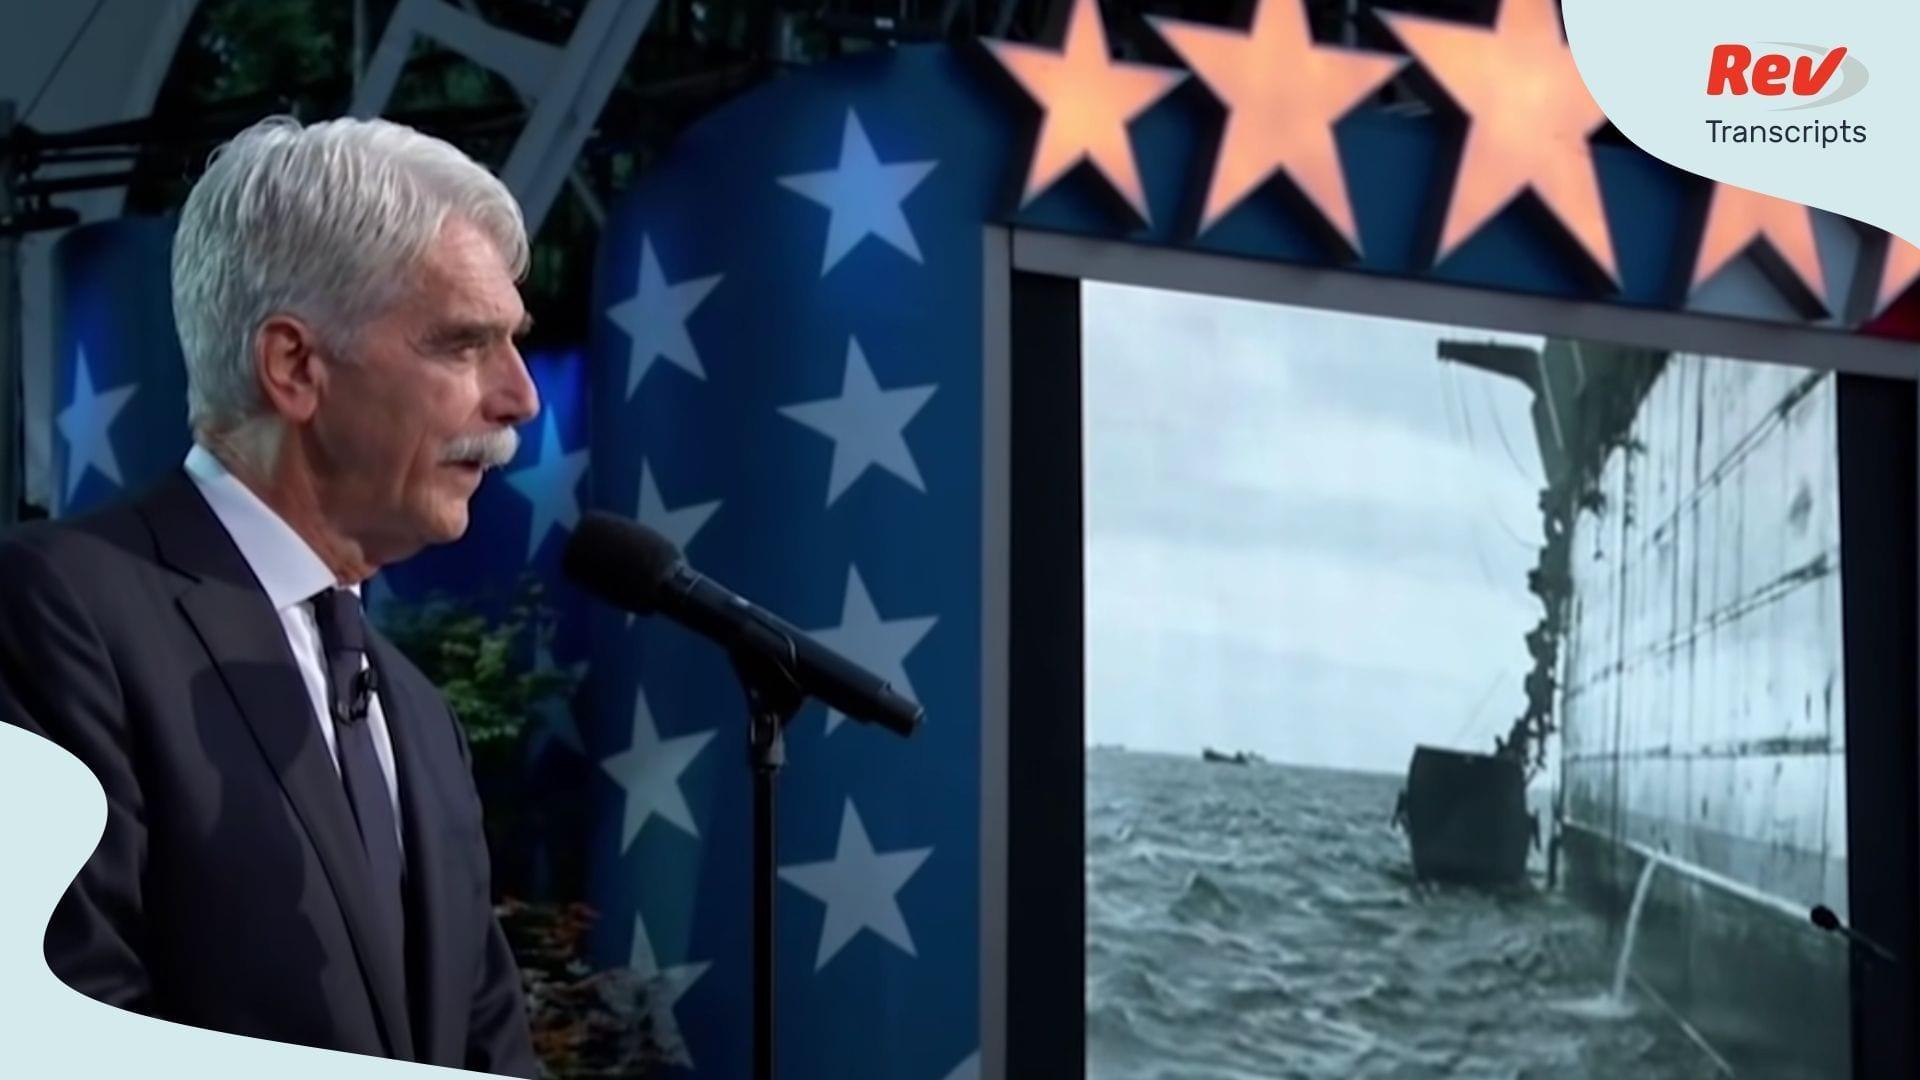 Sam Elliott Memorial Day Speech